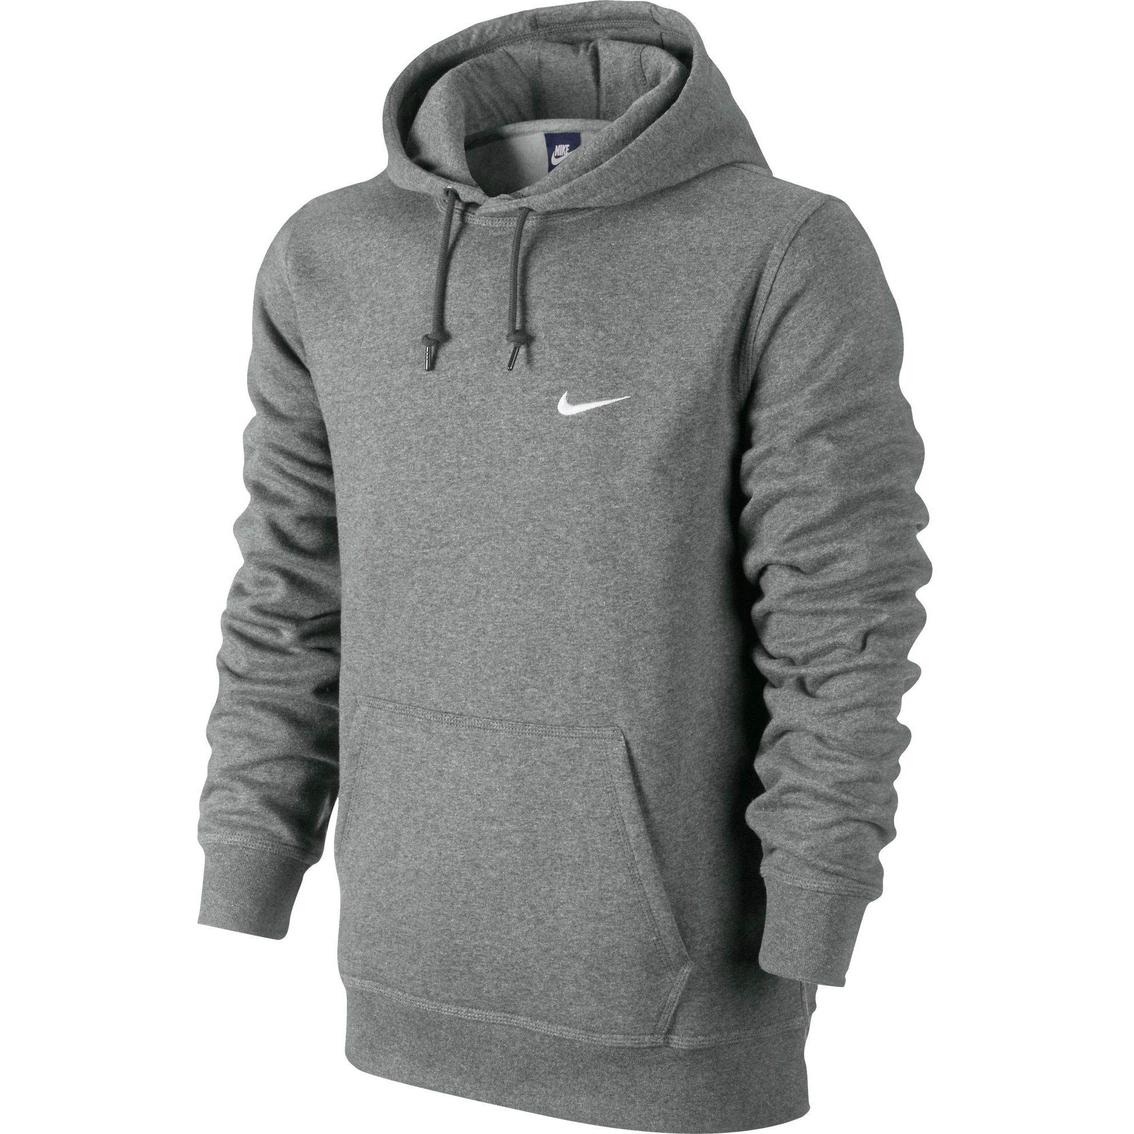 a053c8a5c6 Nike Club Pullover Hoodie